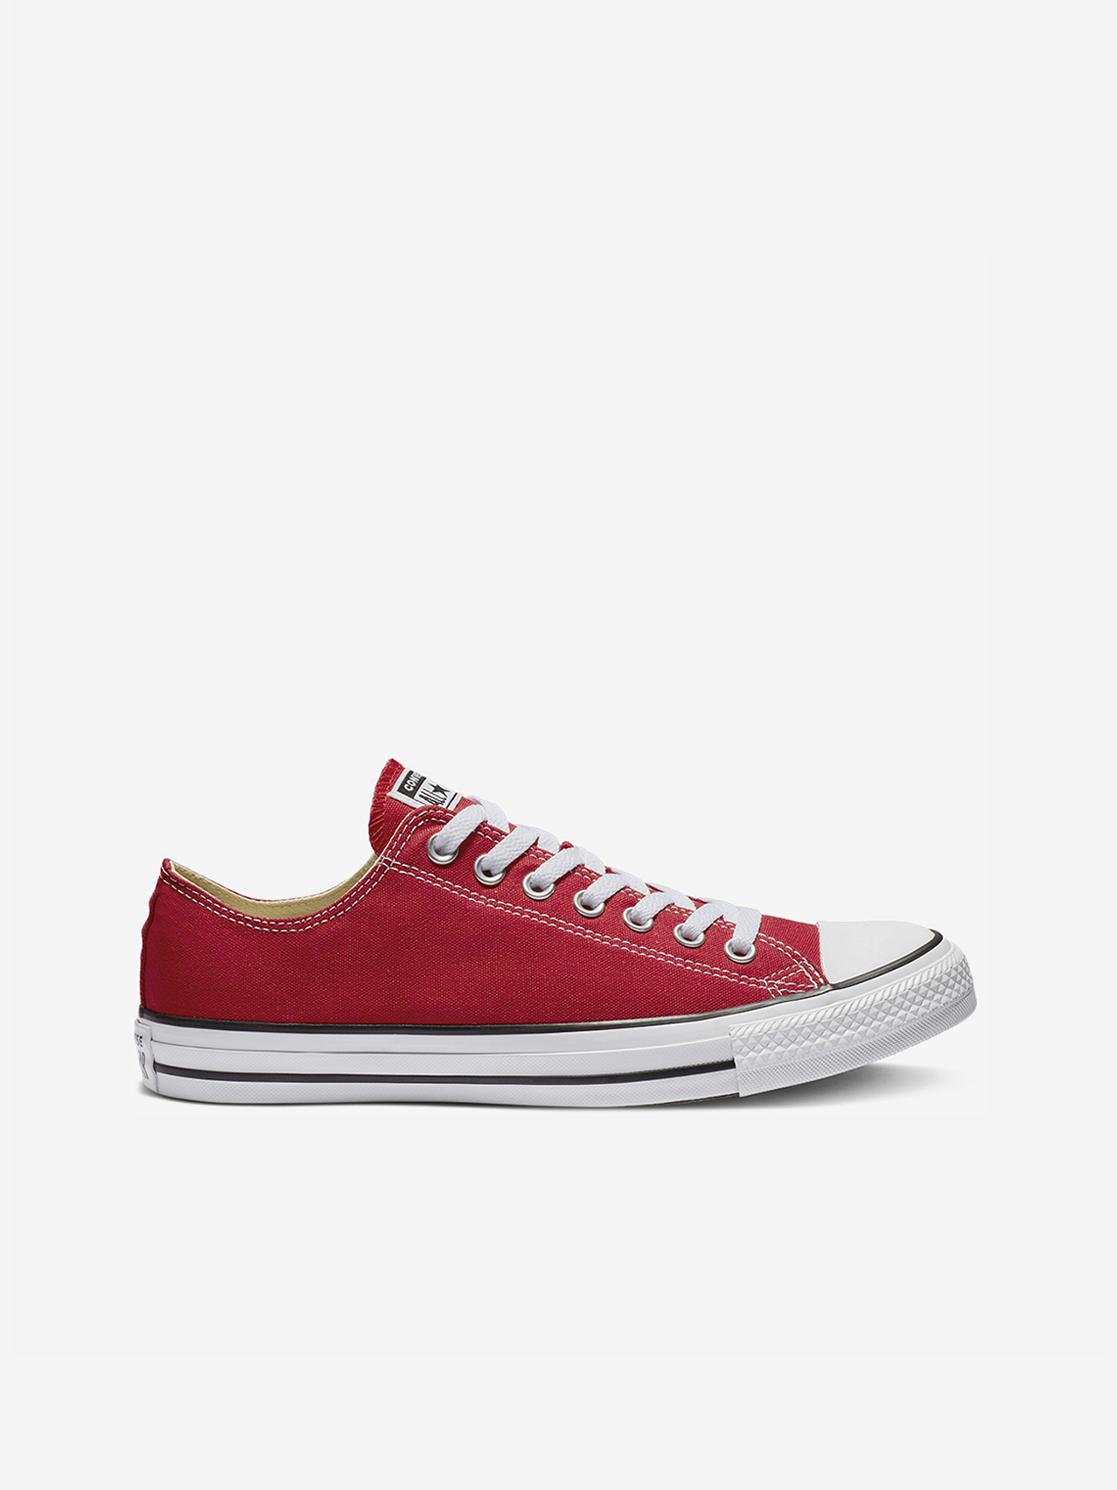 Regeneración Mal entonces  Converse Red Unisex Sneakers Chuck Taylor All Star Classic Colors - Women´s  shoes • Differenta.com